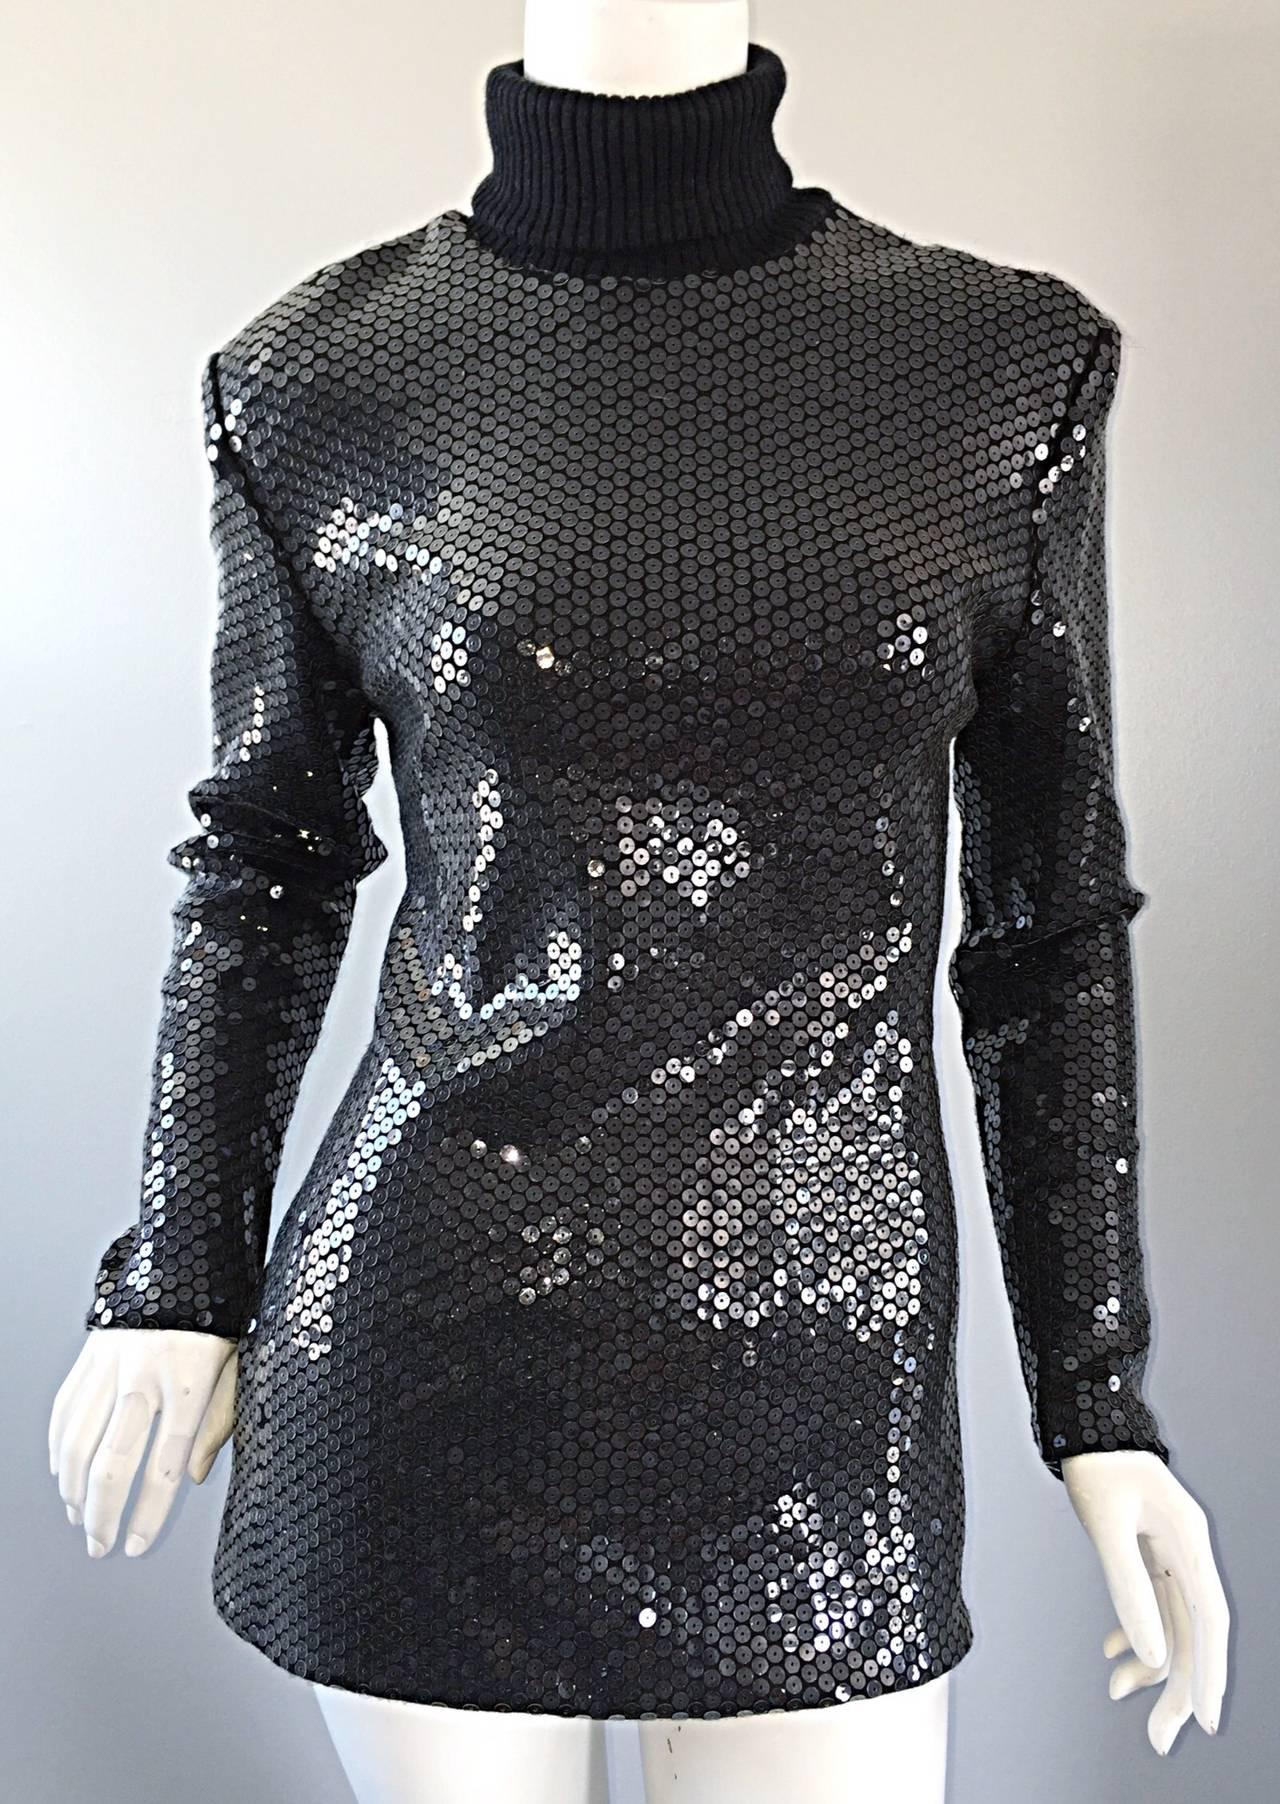 Rare Very Early Michael Kors Runway Sample Gray Sequins Turtleneck Sweater 8